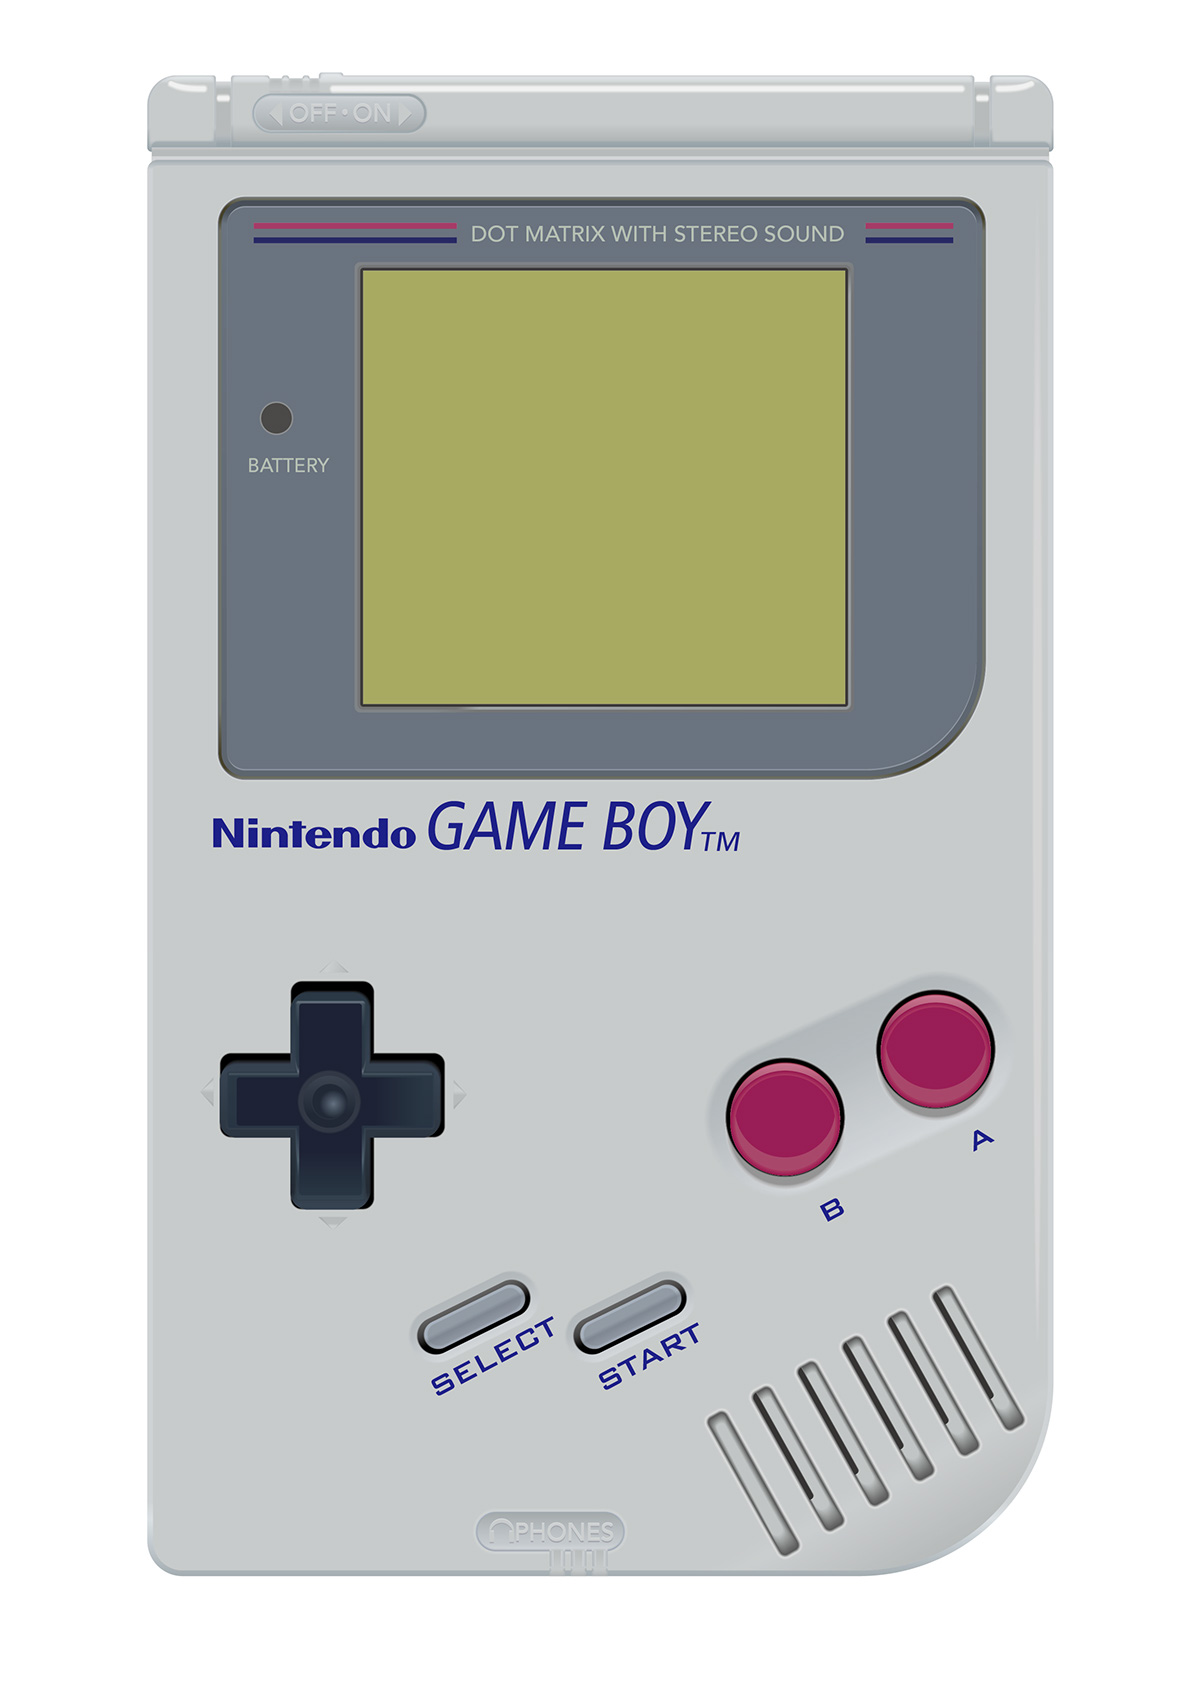 1200x1697 Nintendo Game Boy Vector Illustration On Behance